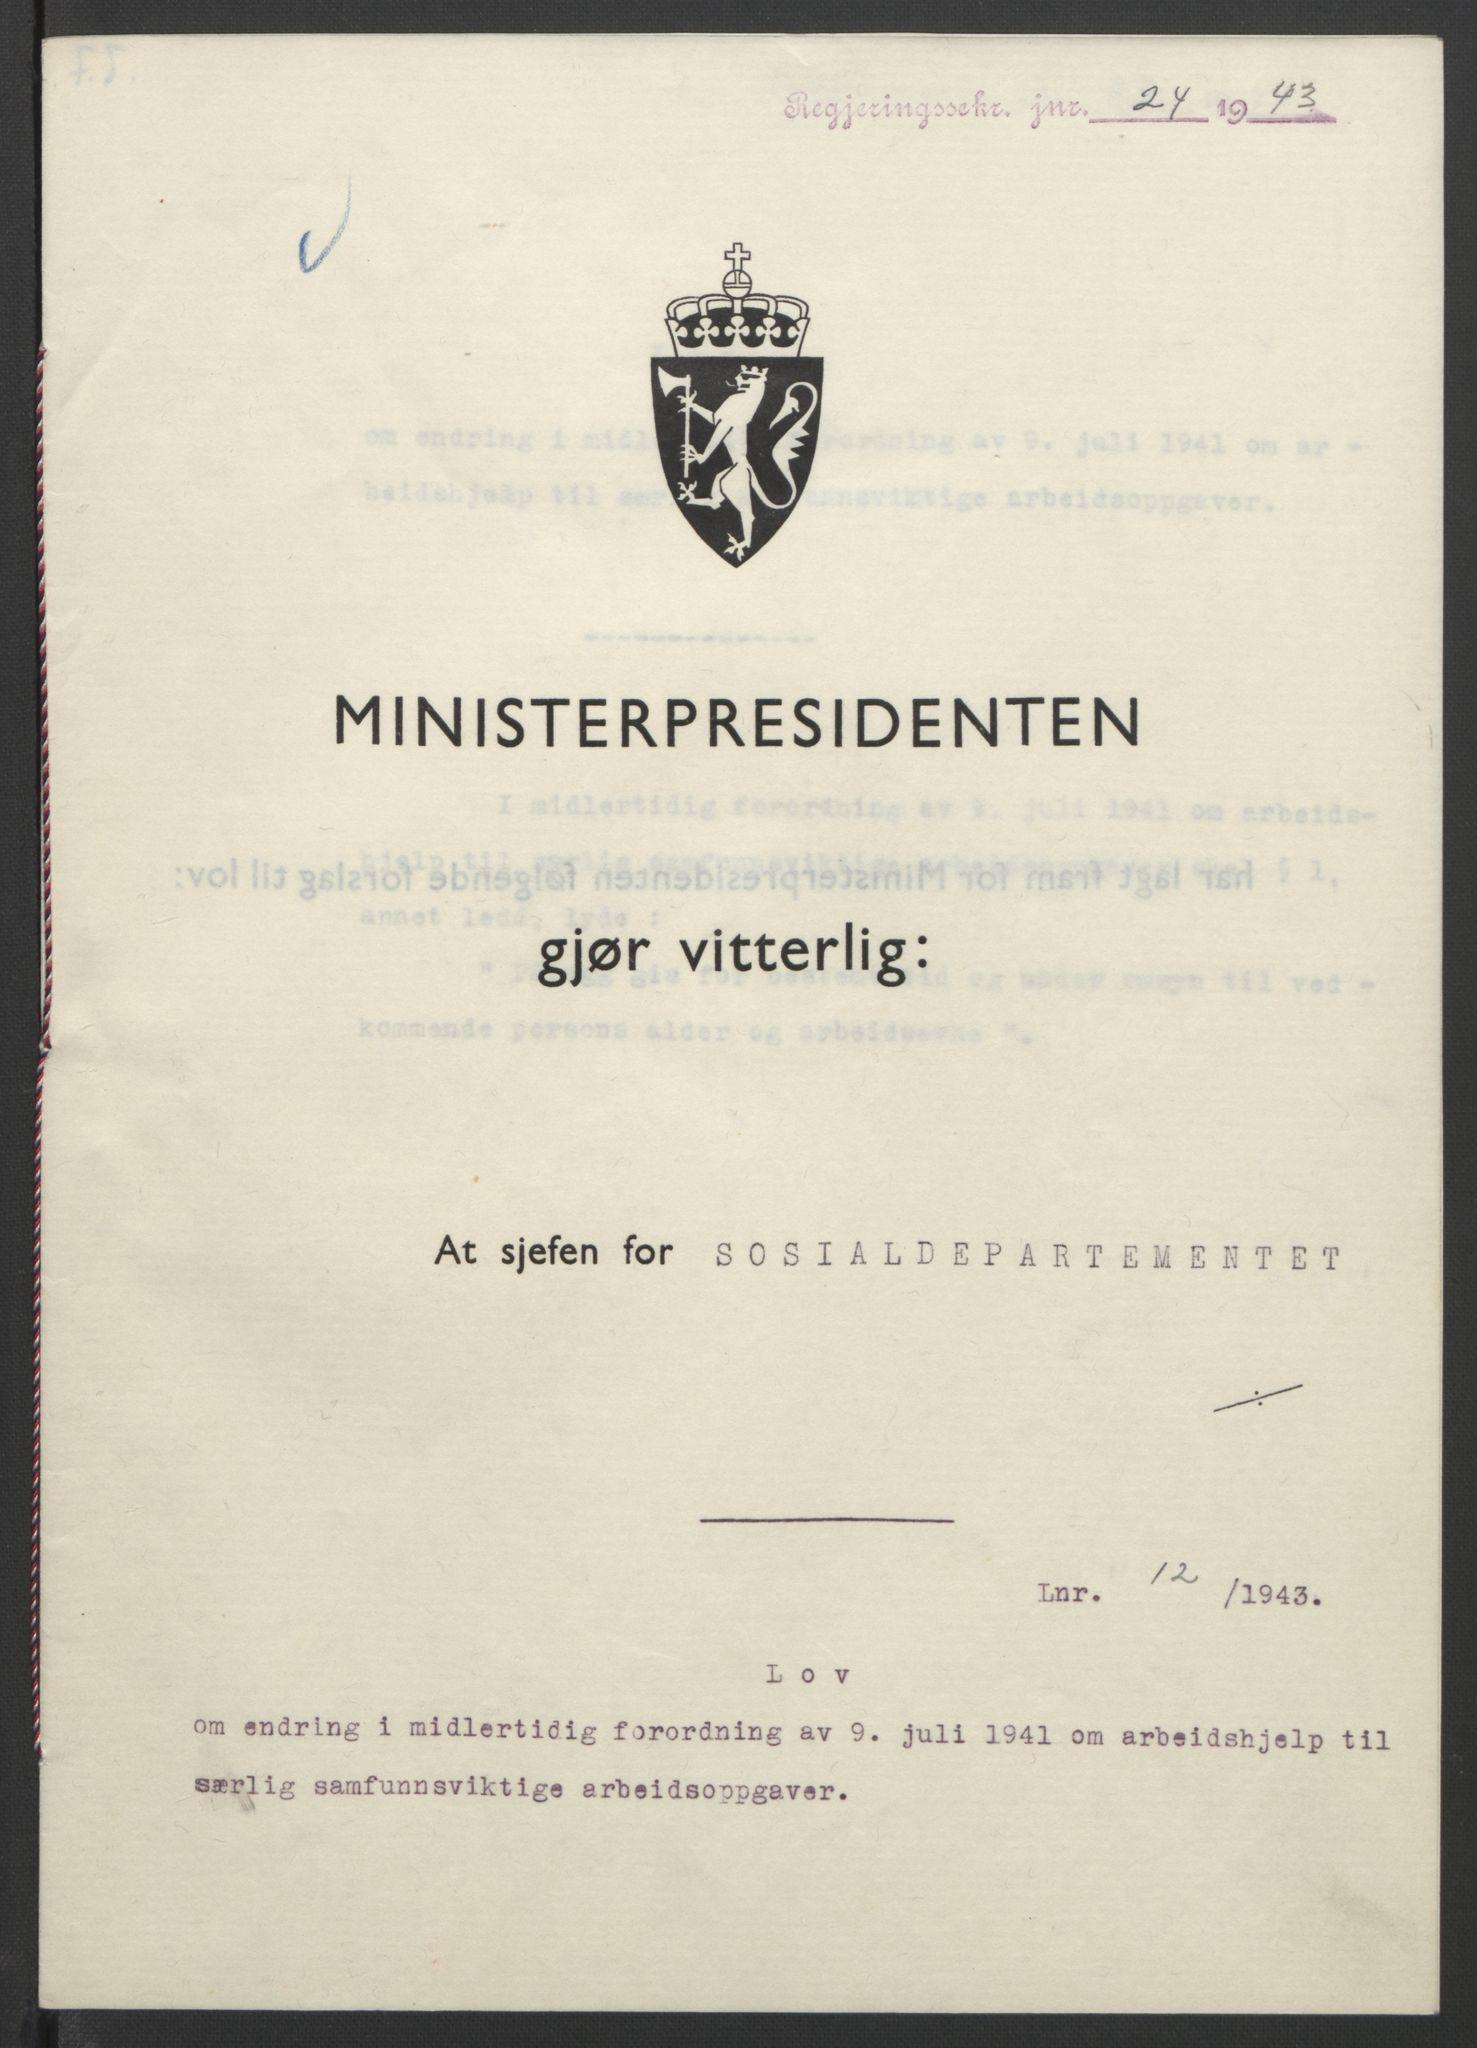 RA, NS-administrasjonen 1940-1945 (Statsrådsekretariatet, de kommisariske statsråder mm), D/Db/L0099: Lover, 1943, s. 48